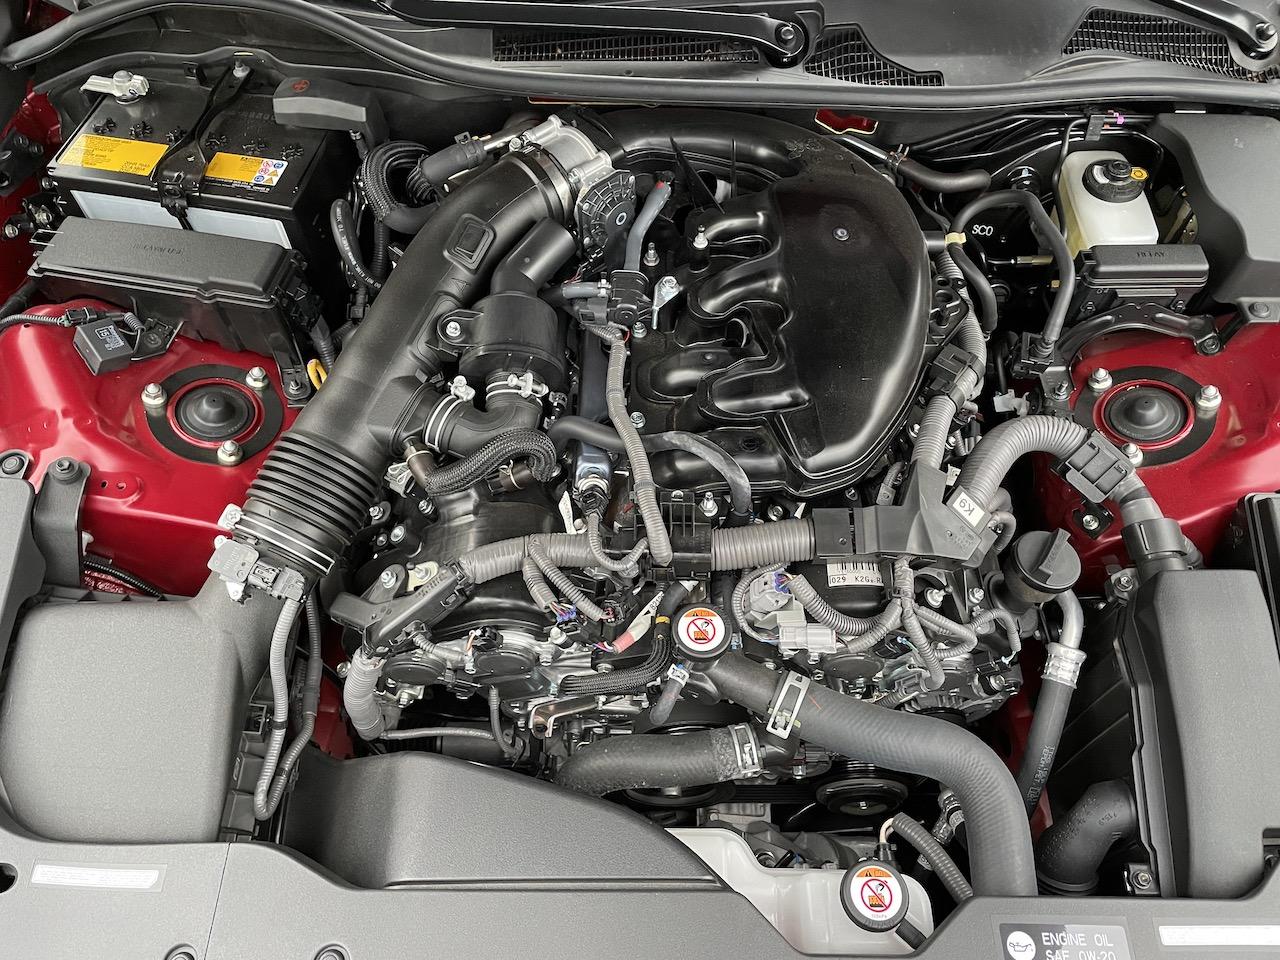 2020 Lexus GS350 AWD engine